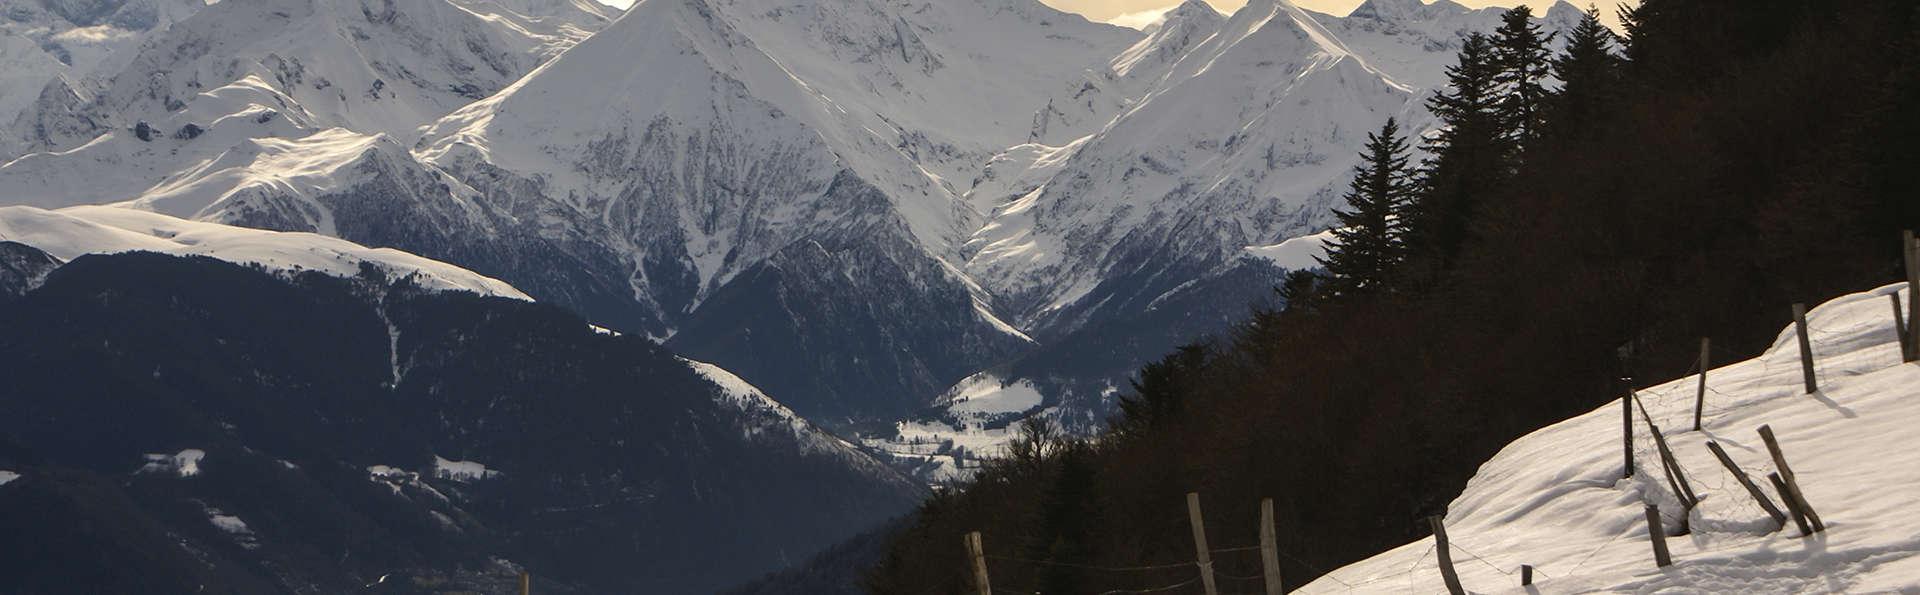 Descubre la naturaleza Andorrana a tu ritmo en Pas de la Casa